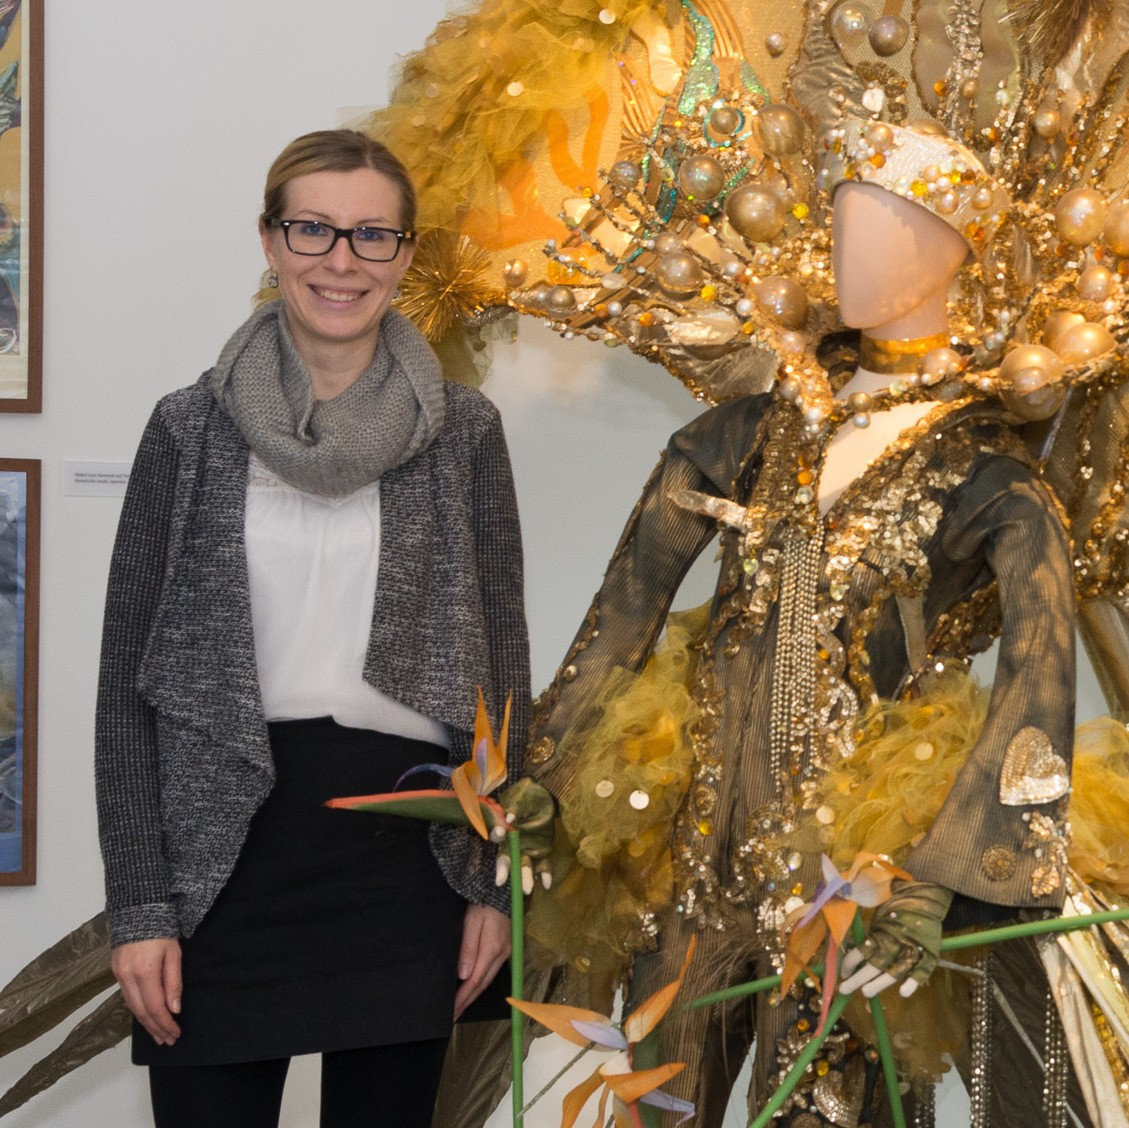 Museumsleiterin Dr. Daniela Sandner